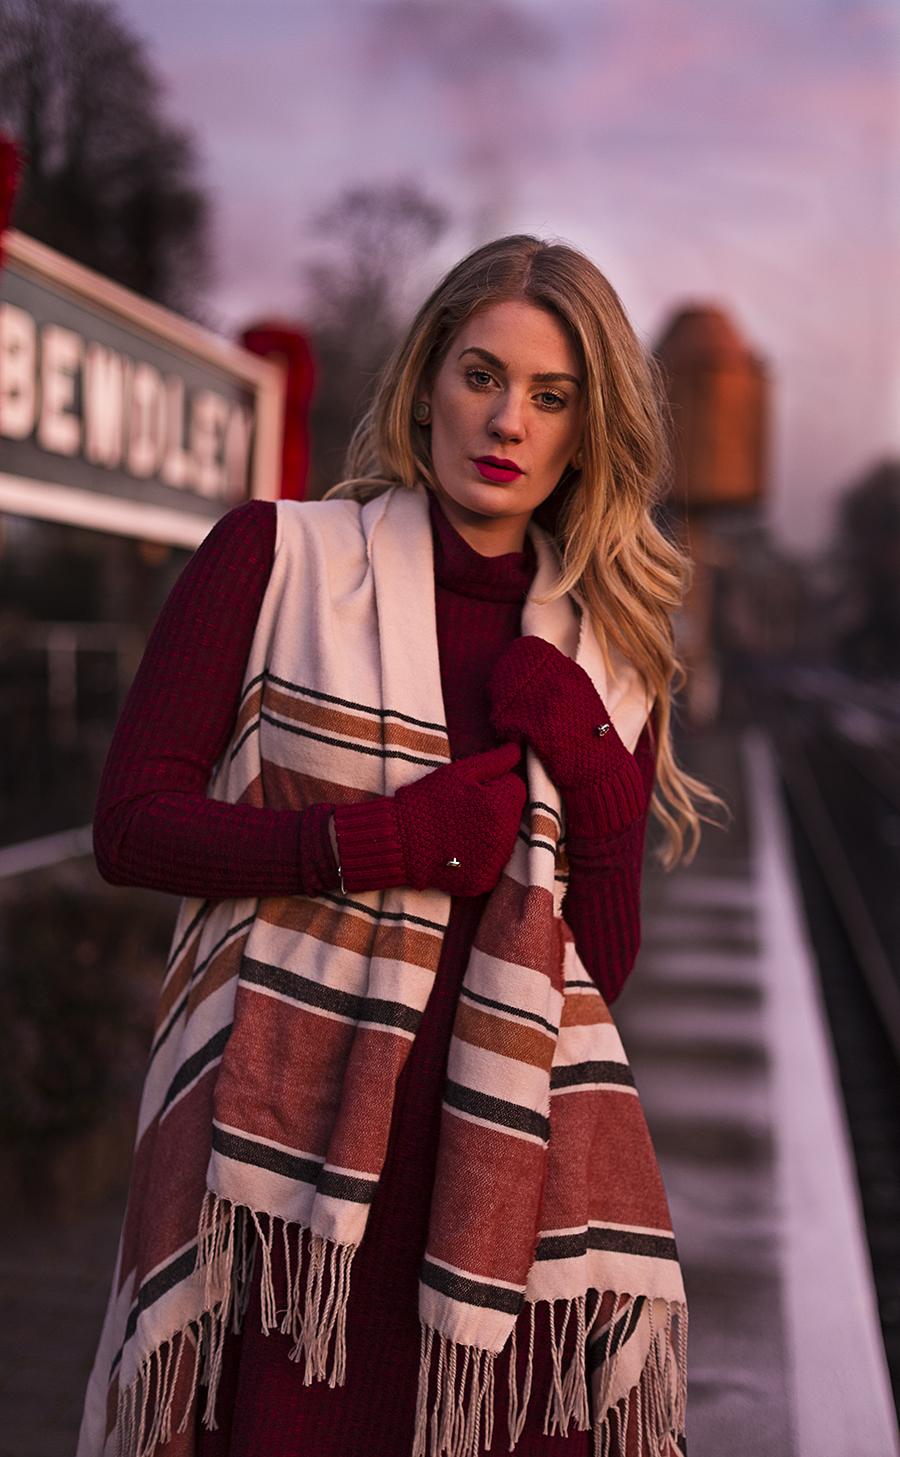 Railway Catwalk / Photography by GaryMac Photography, Model Artemis Fauna / Uploaded 20th December 2016 @ 10:19 PM